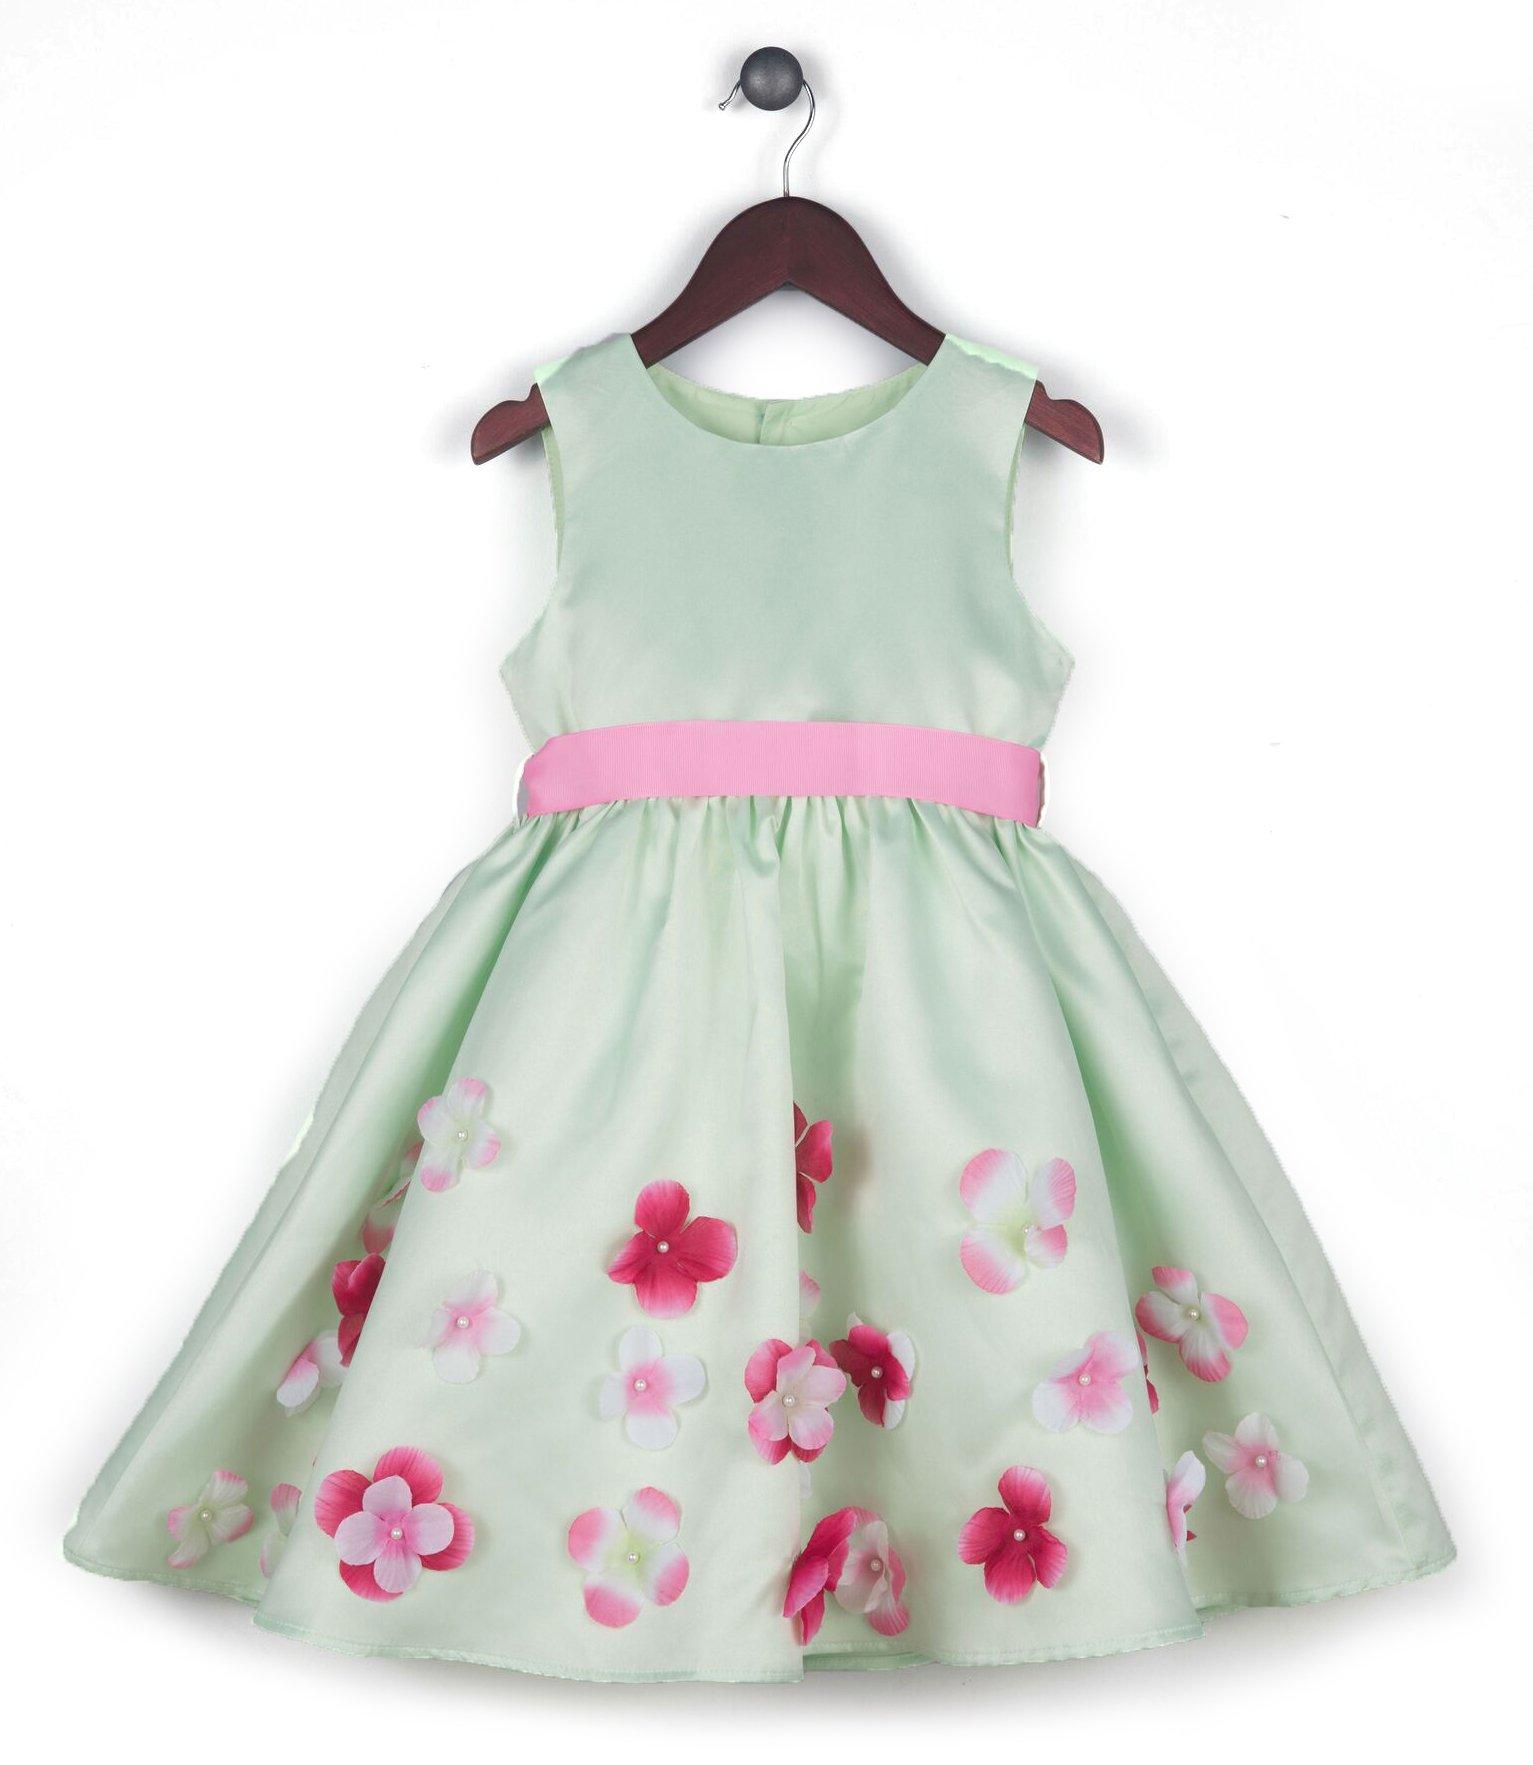 Joe and Ella Fashion Dievčenské šaty Layla s kvetinami - svetlozelené bc5b3fd6534